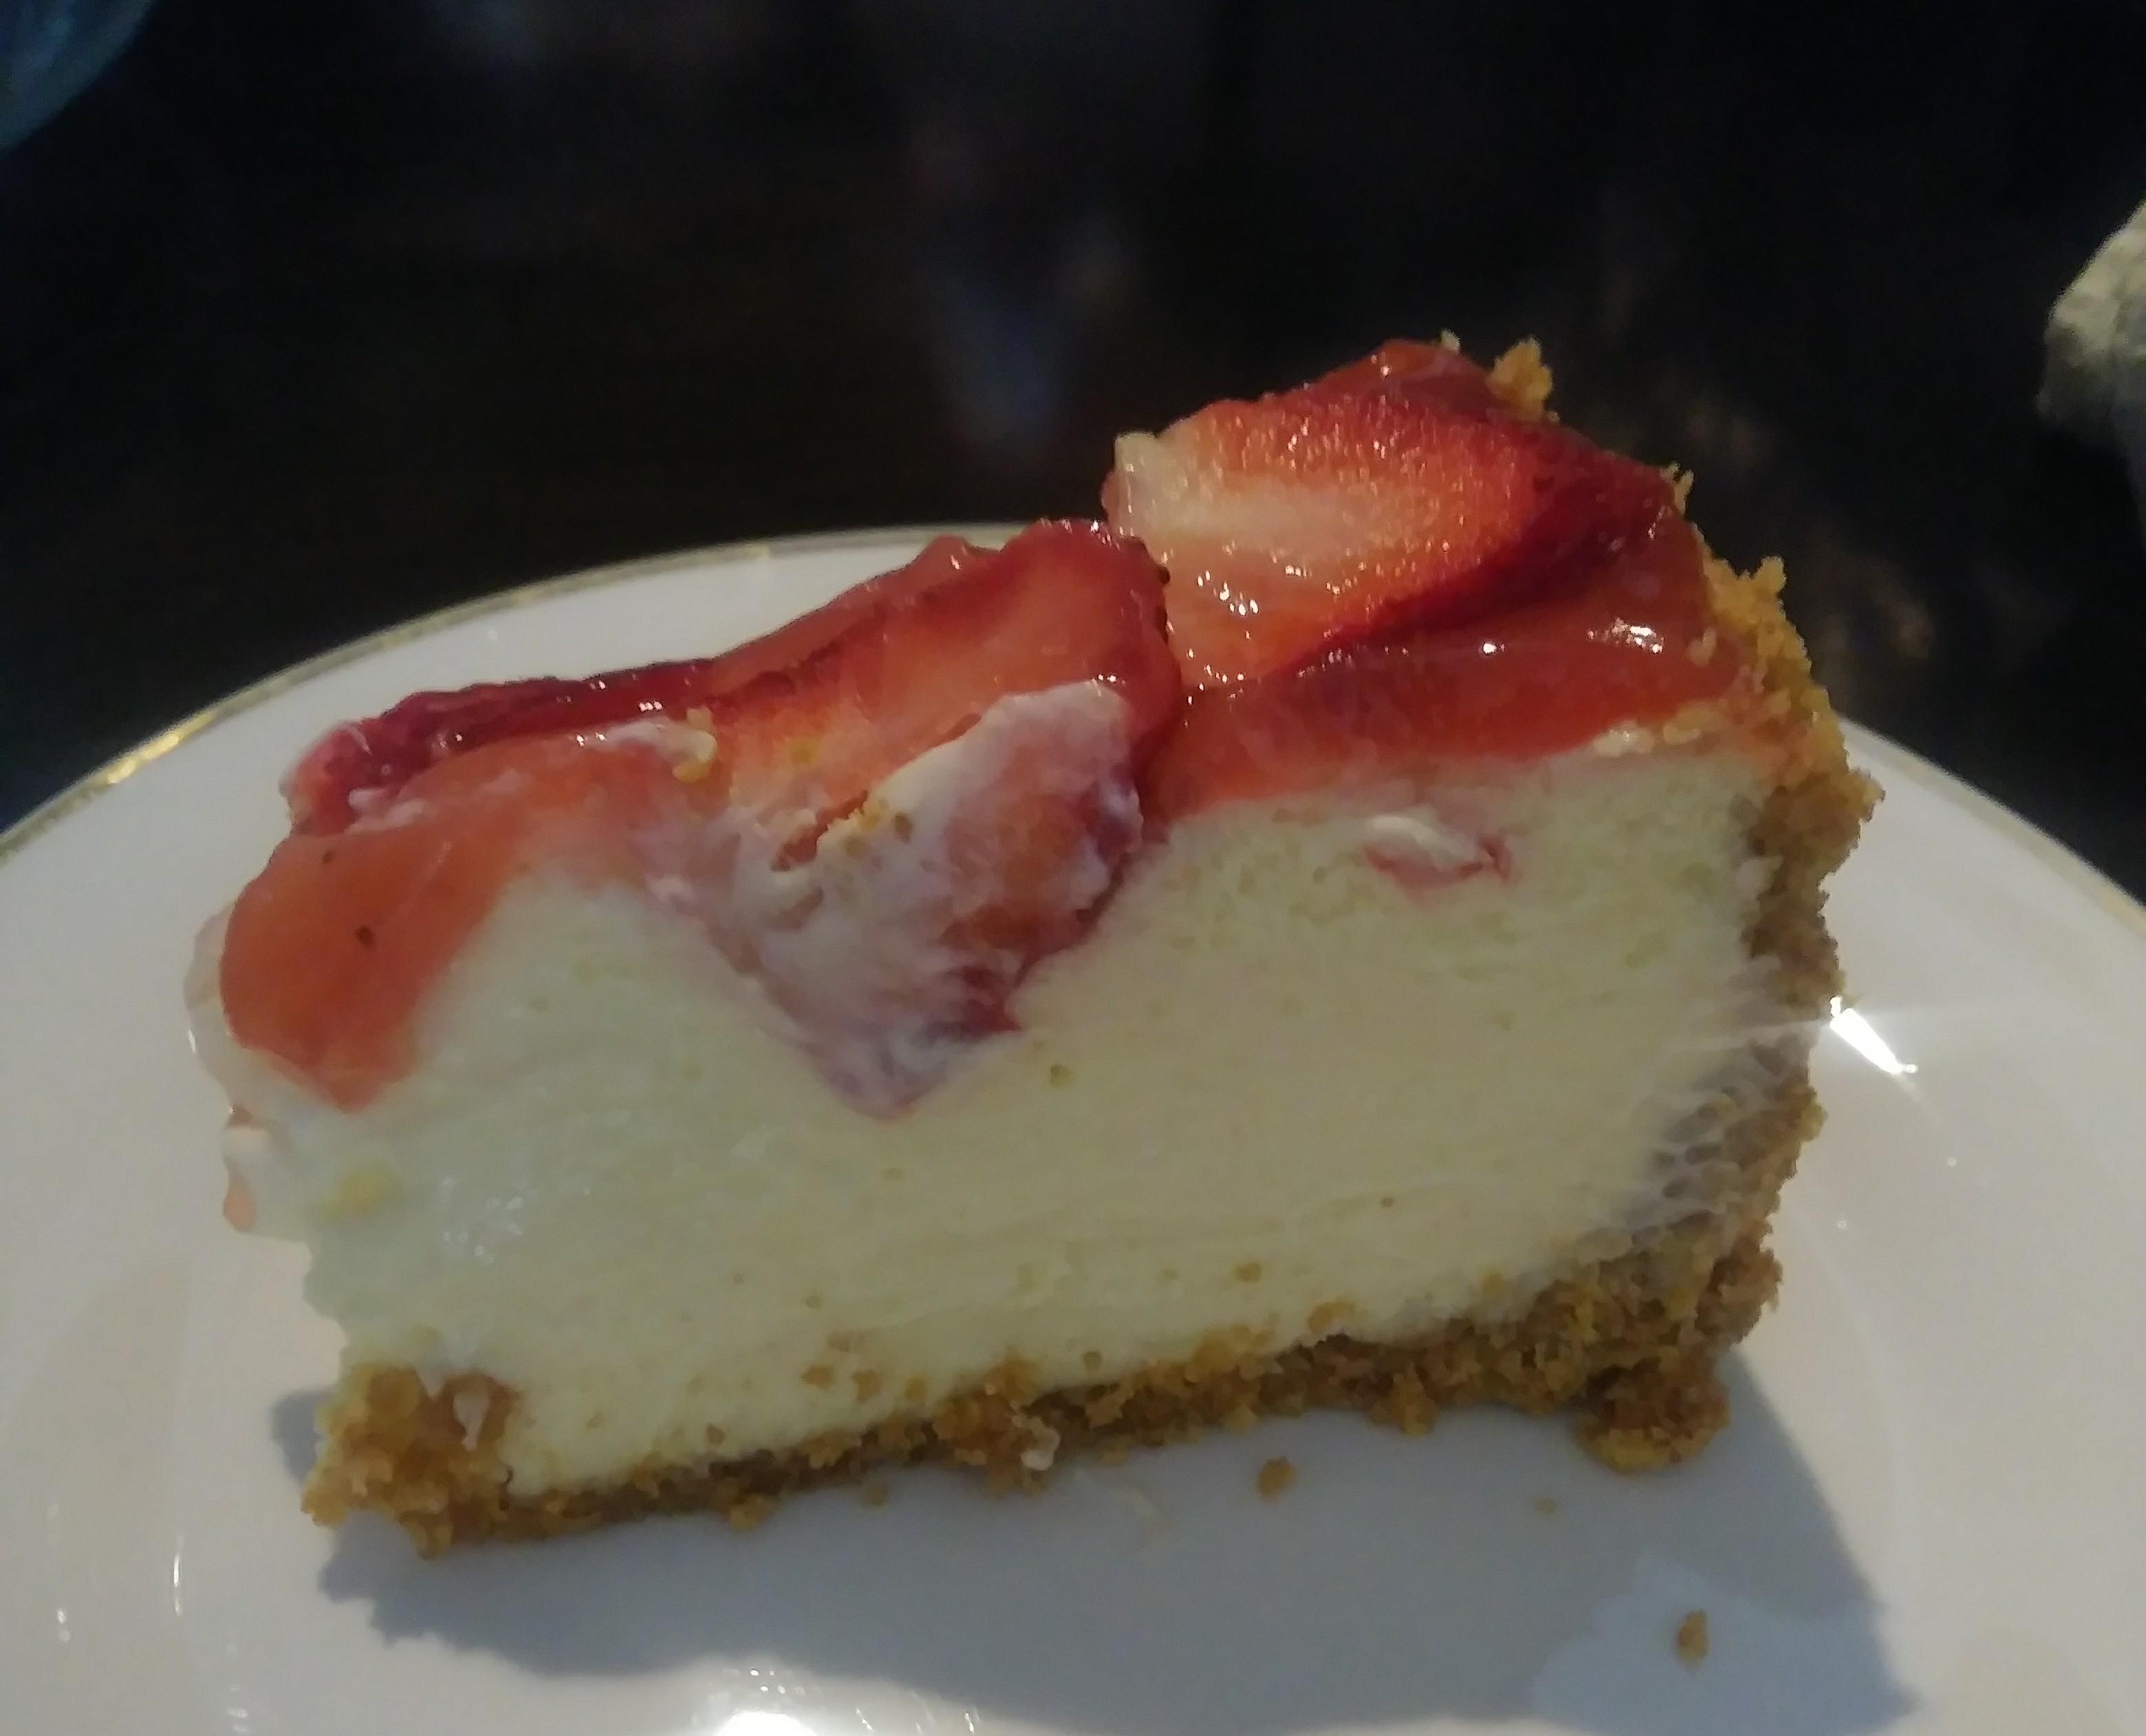 Red Velvet Cake Gloria Albarran Rivera